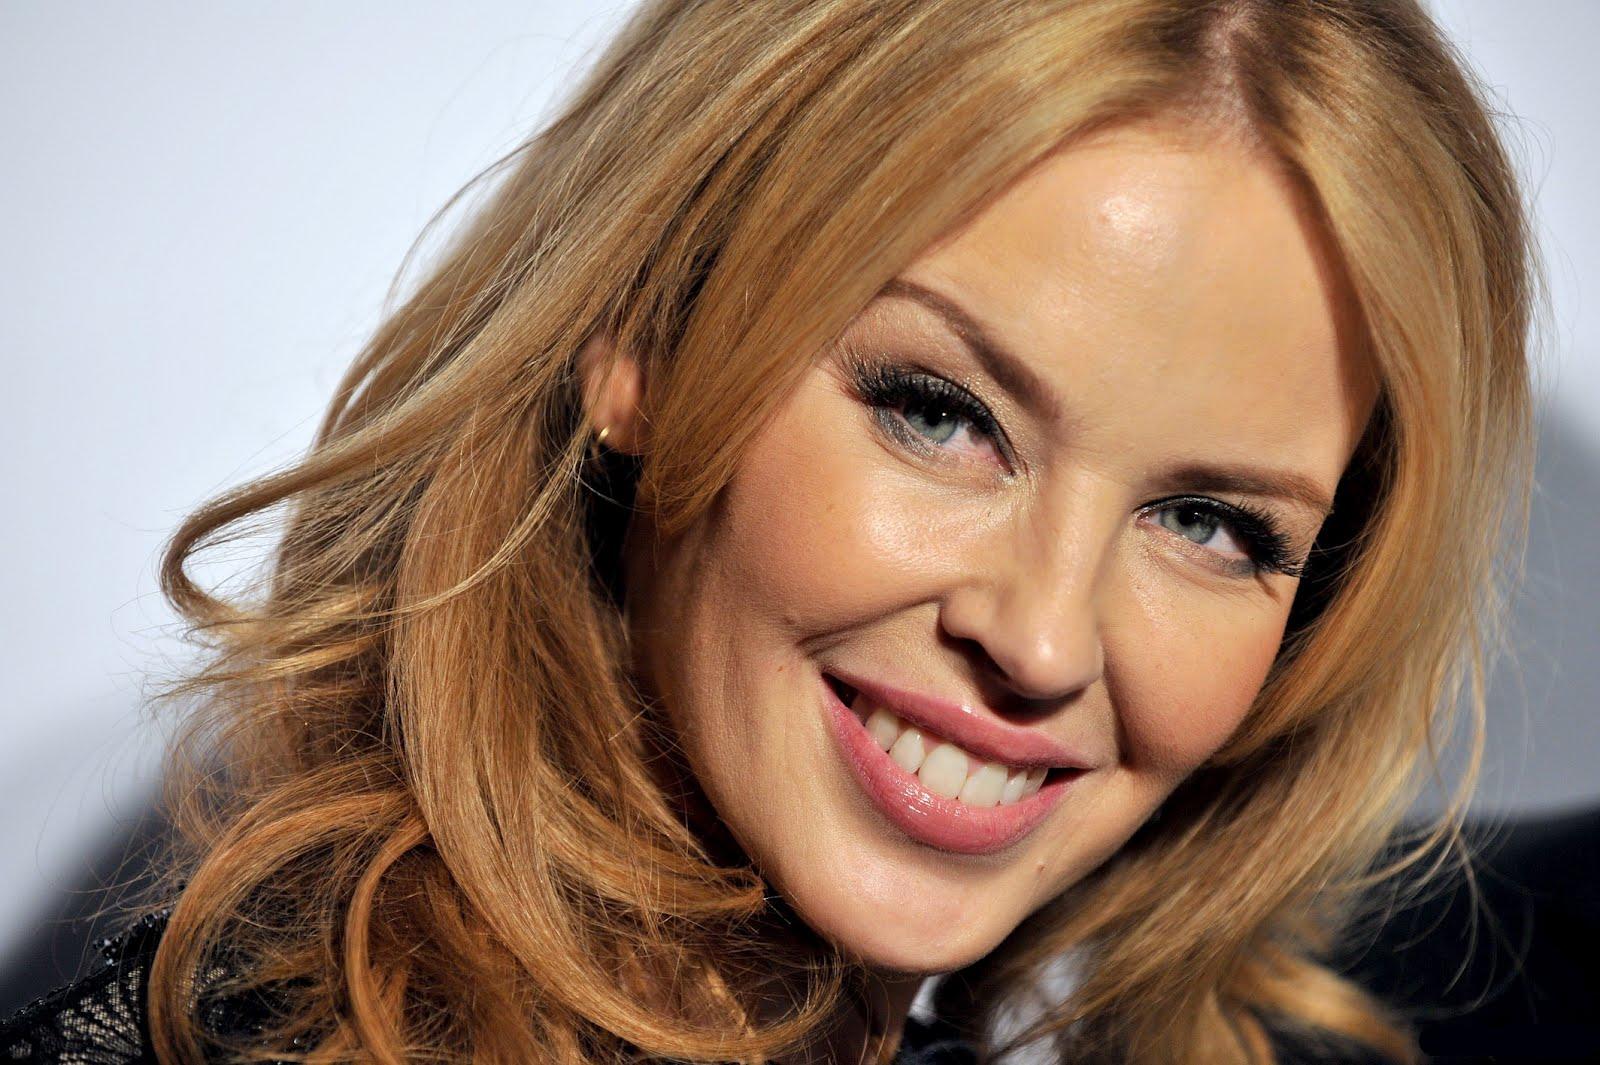 Londra, Kylie Minogue a Oxford Street illumina il Natale con 445 palline d'oro